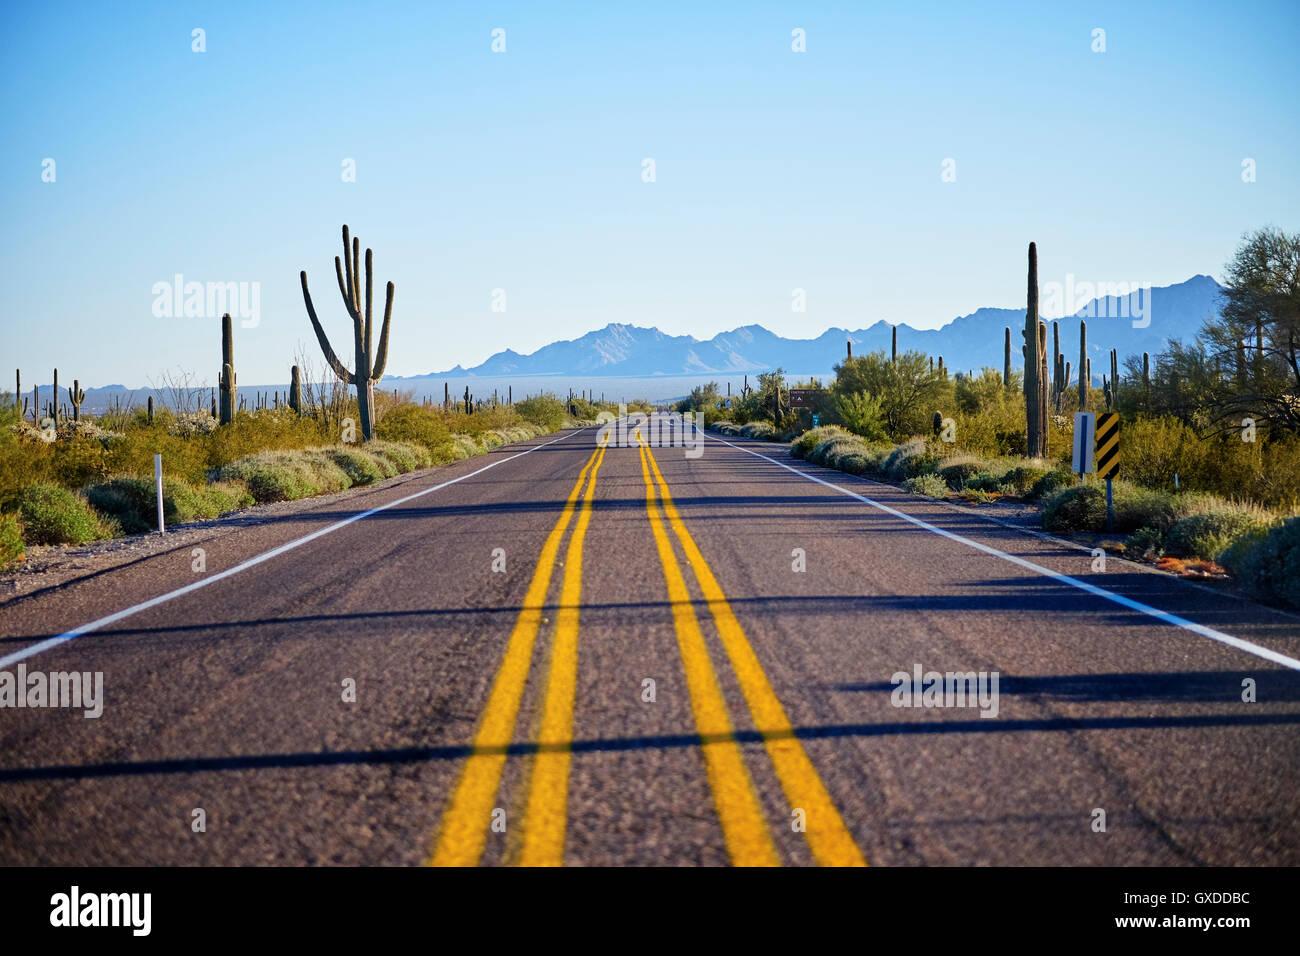 Desert highway, Organ Pipe Cactus National Monument, Arizona, USA - Stock Image